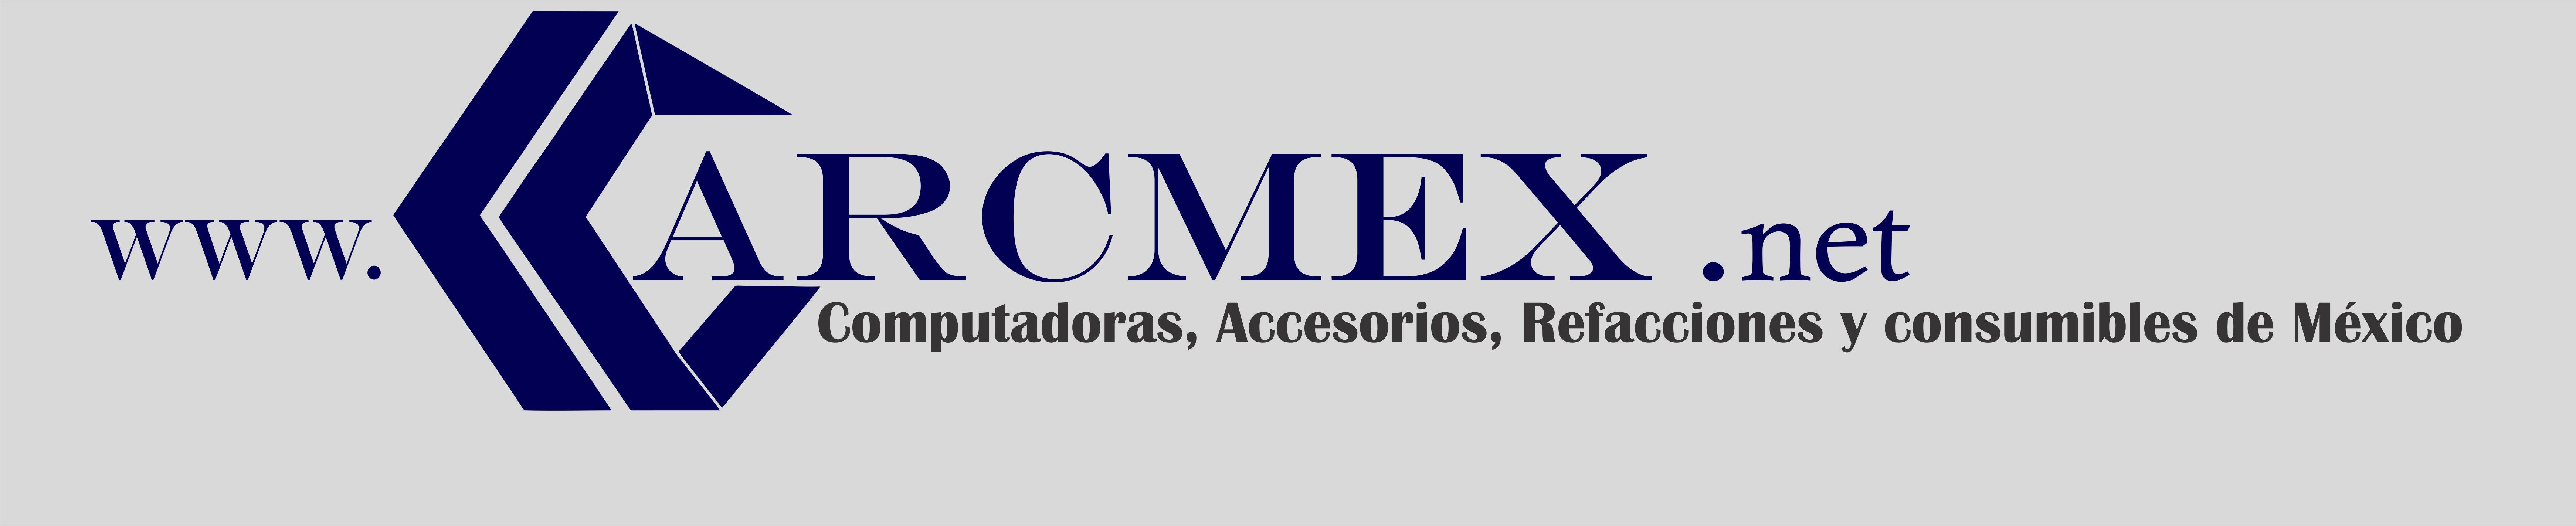 baner-carcmex-arr-1.jpg